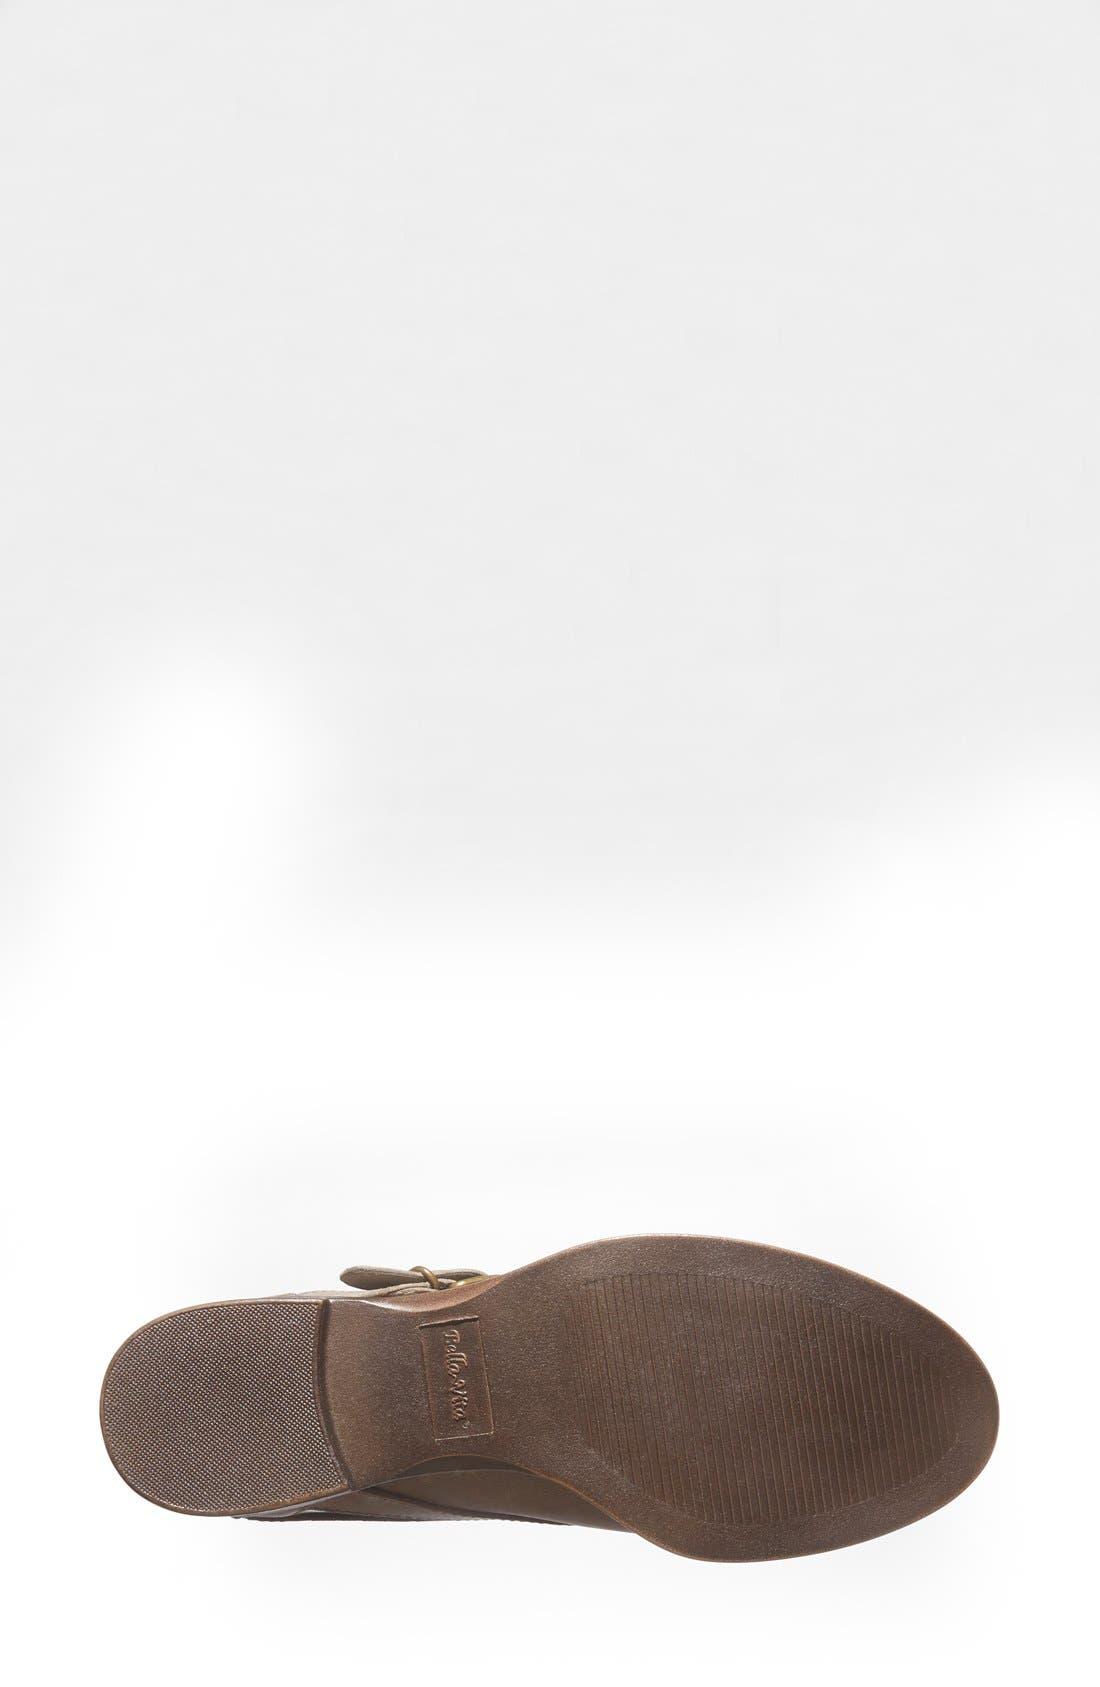 'Ronan' Buckle Leather Bootie,                             Alternate thumbnail 23, color,